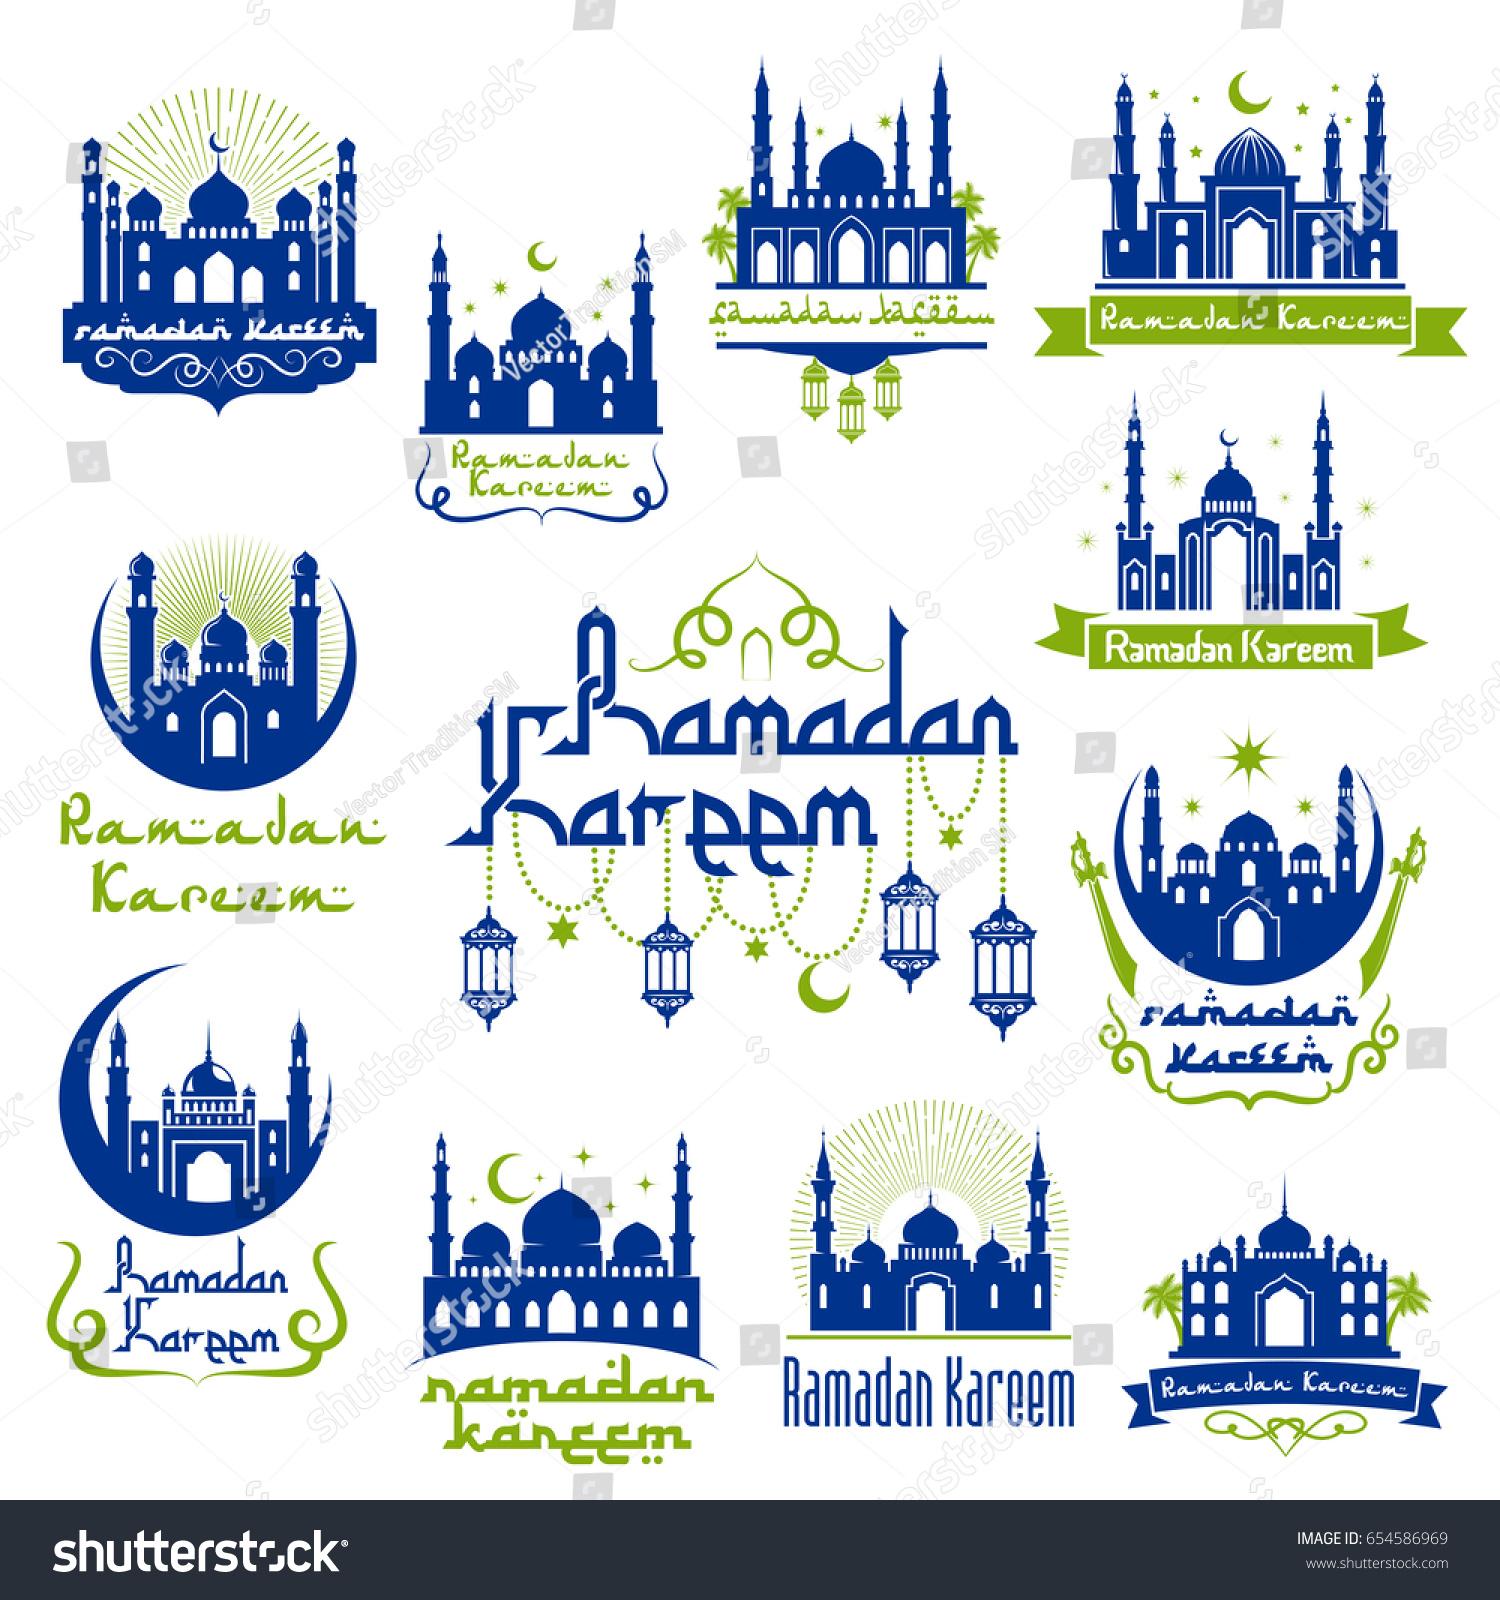 Ramadan kareem holy month celebration symbols stock vector ramadan kareem holy month celebration symbols arabic muslim mosque blue silhouette with moon lantern biocorpaavc